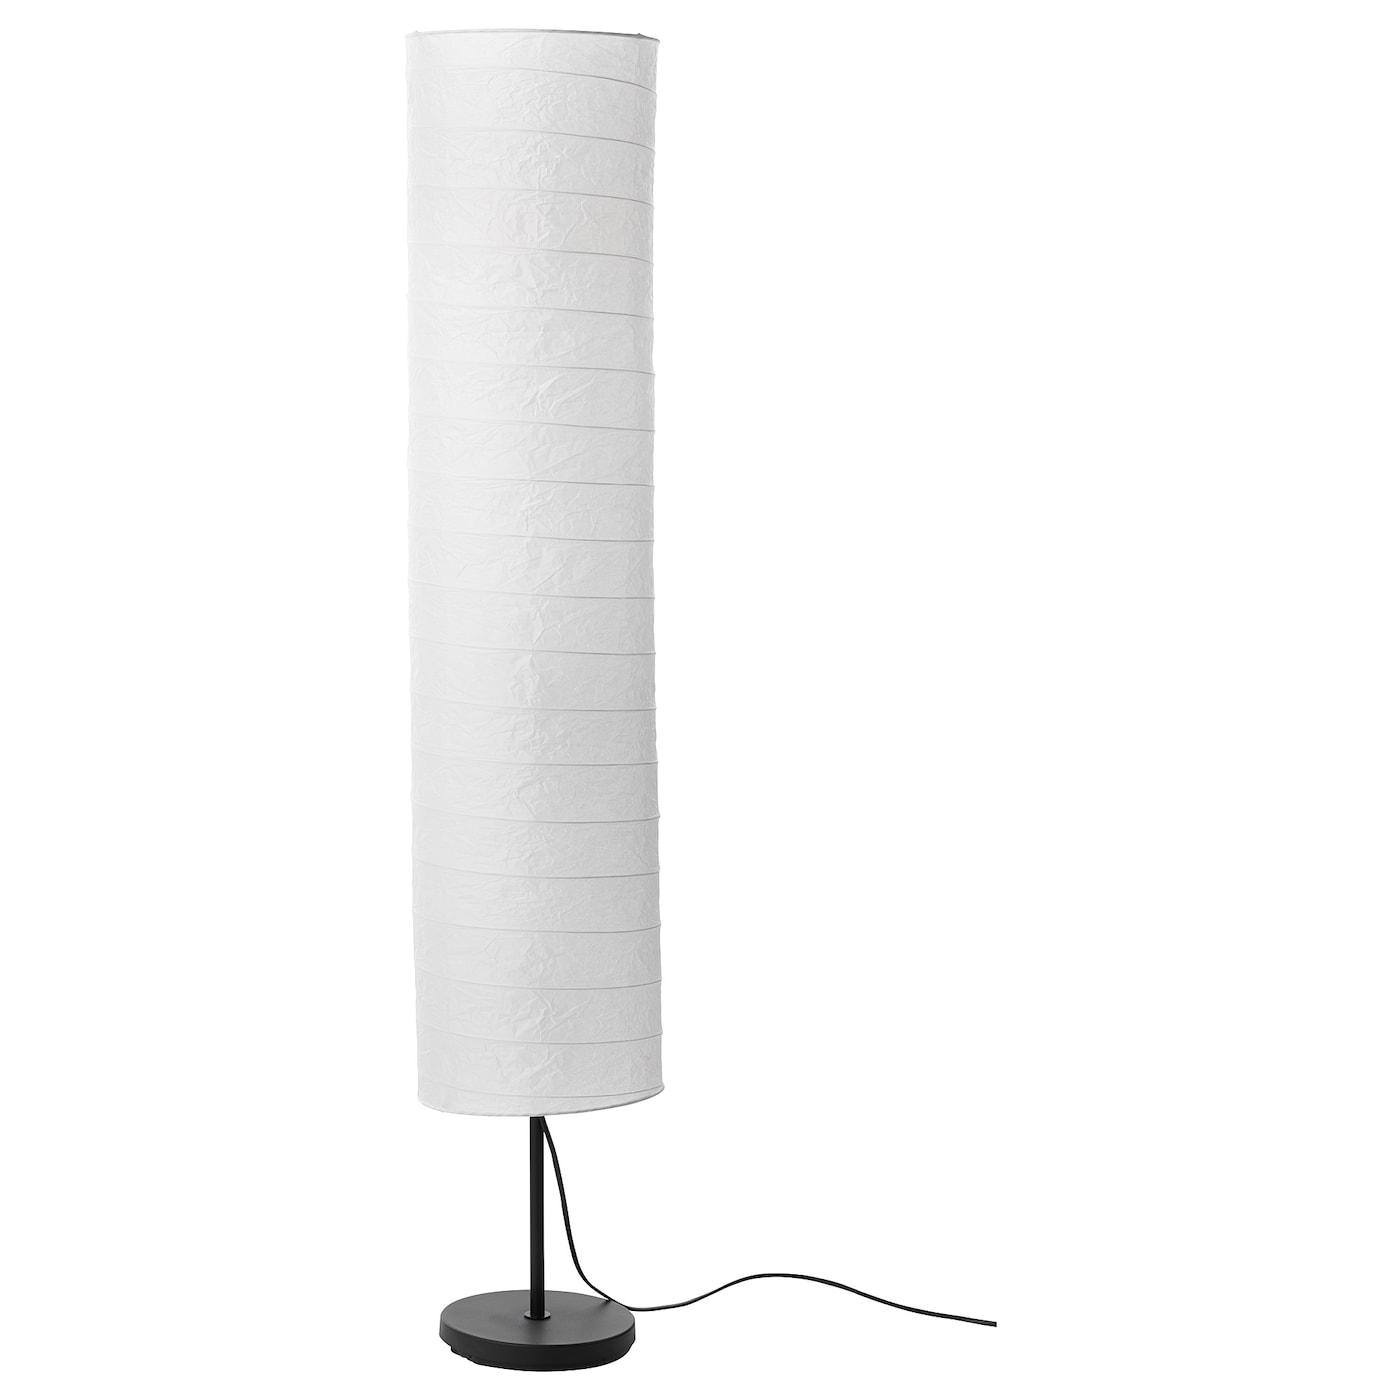 IKEA HOLMO FLOOR LAMP WHITE RICE PAPER